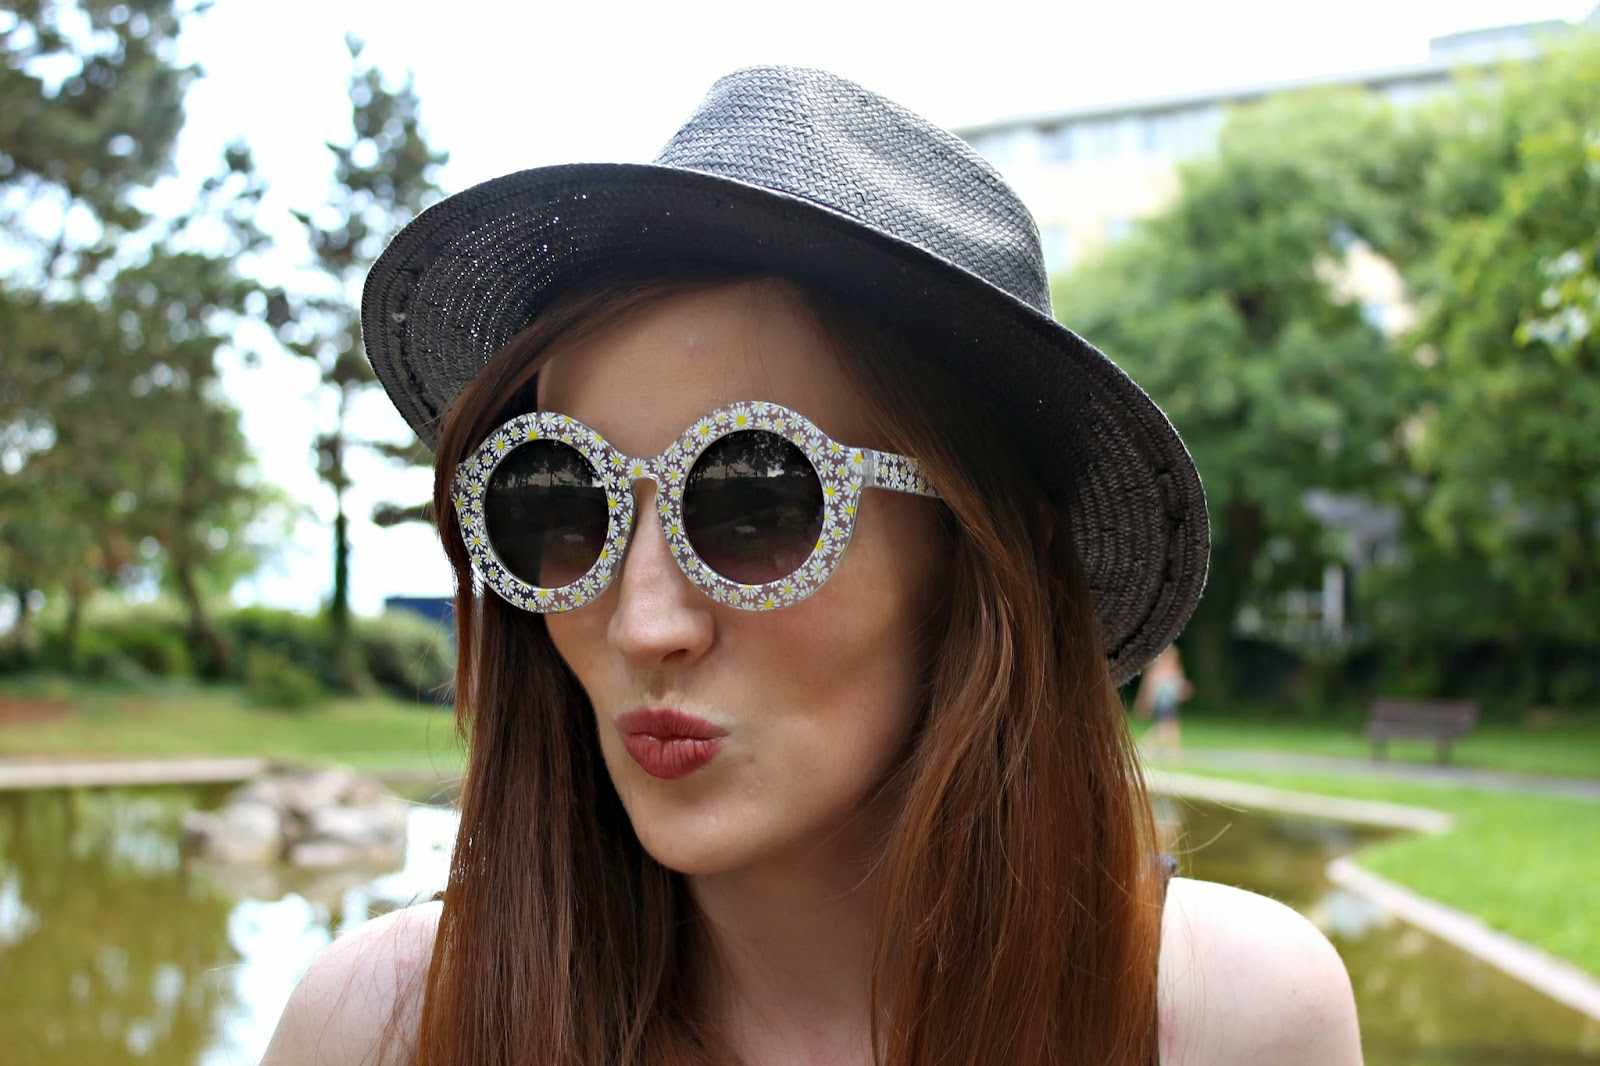 bec boop sunglasses